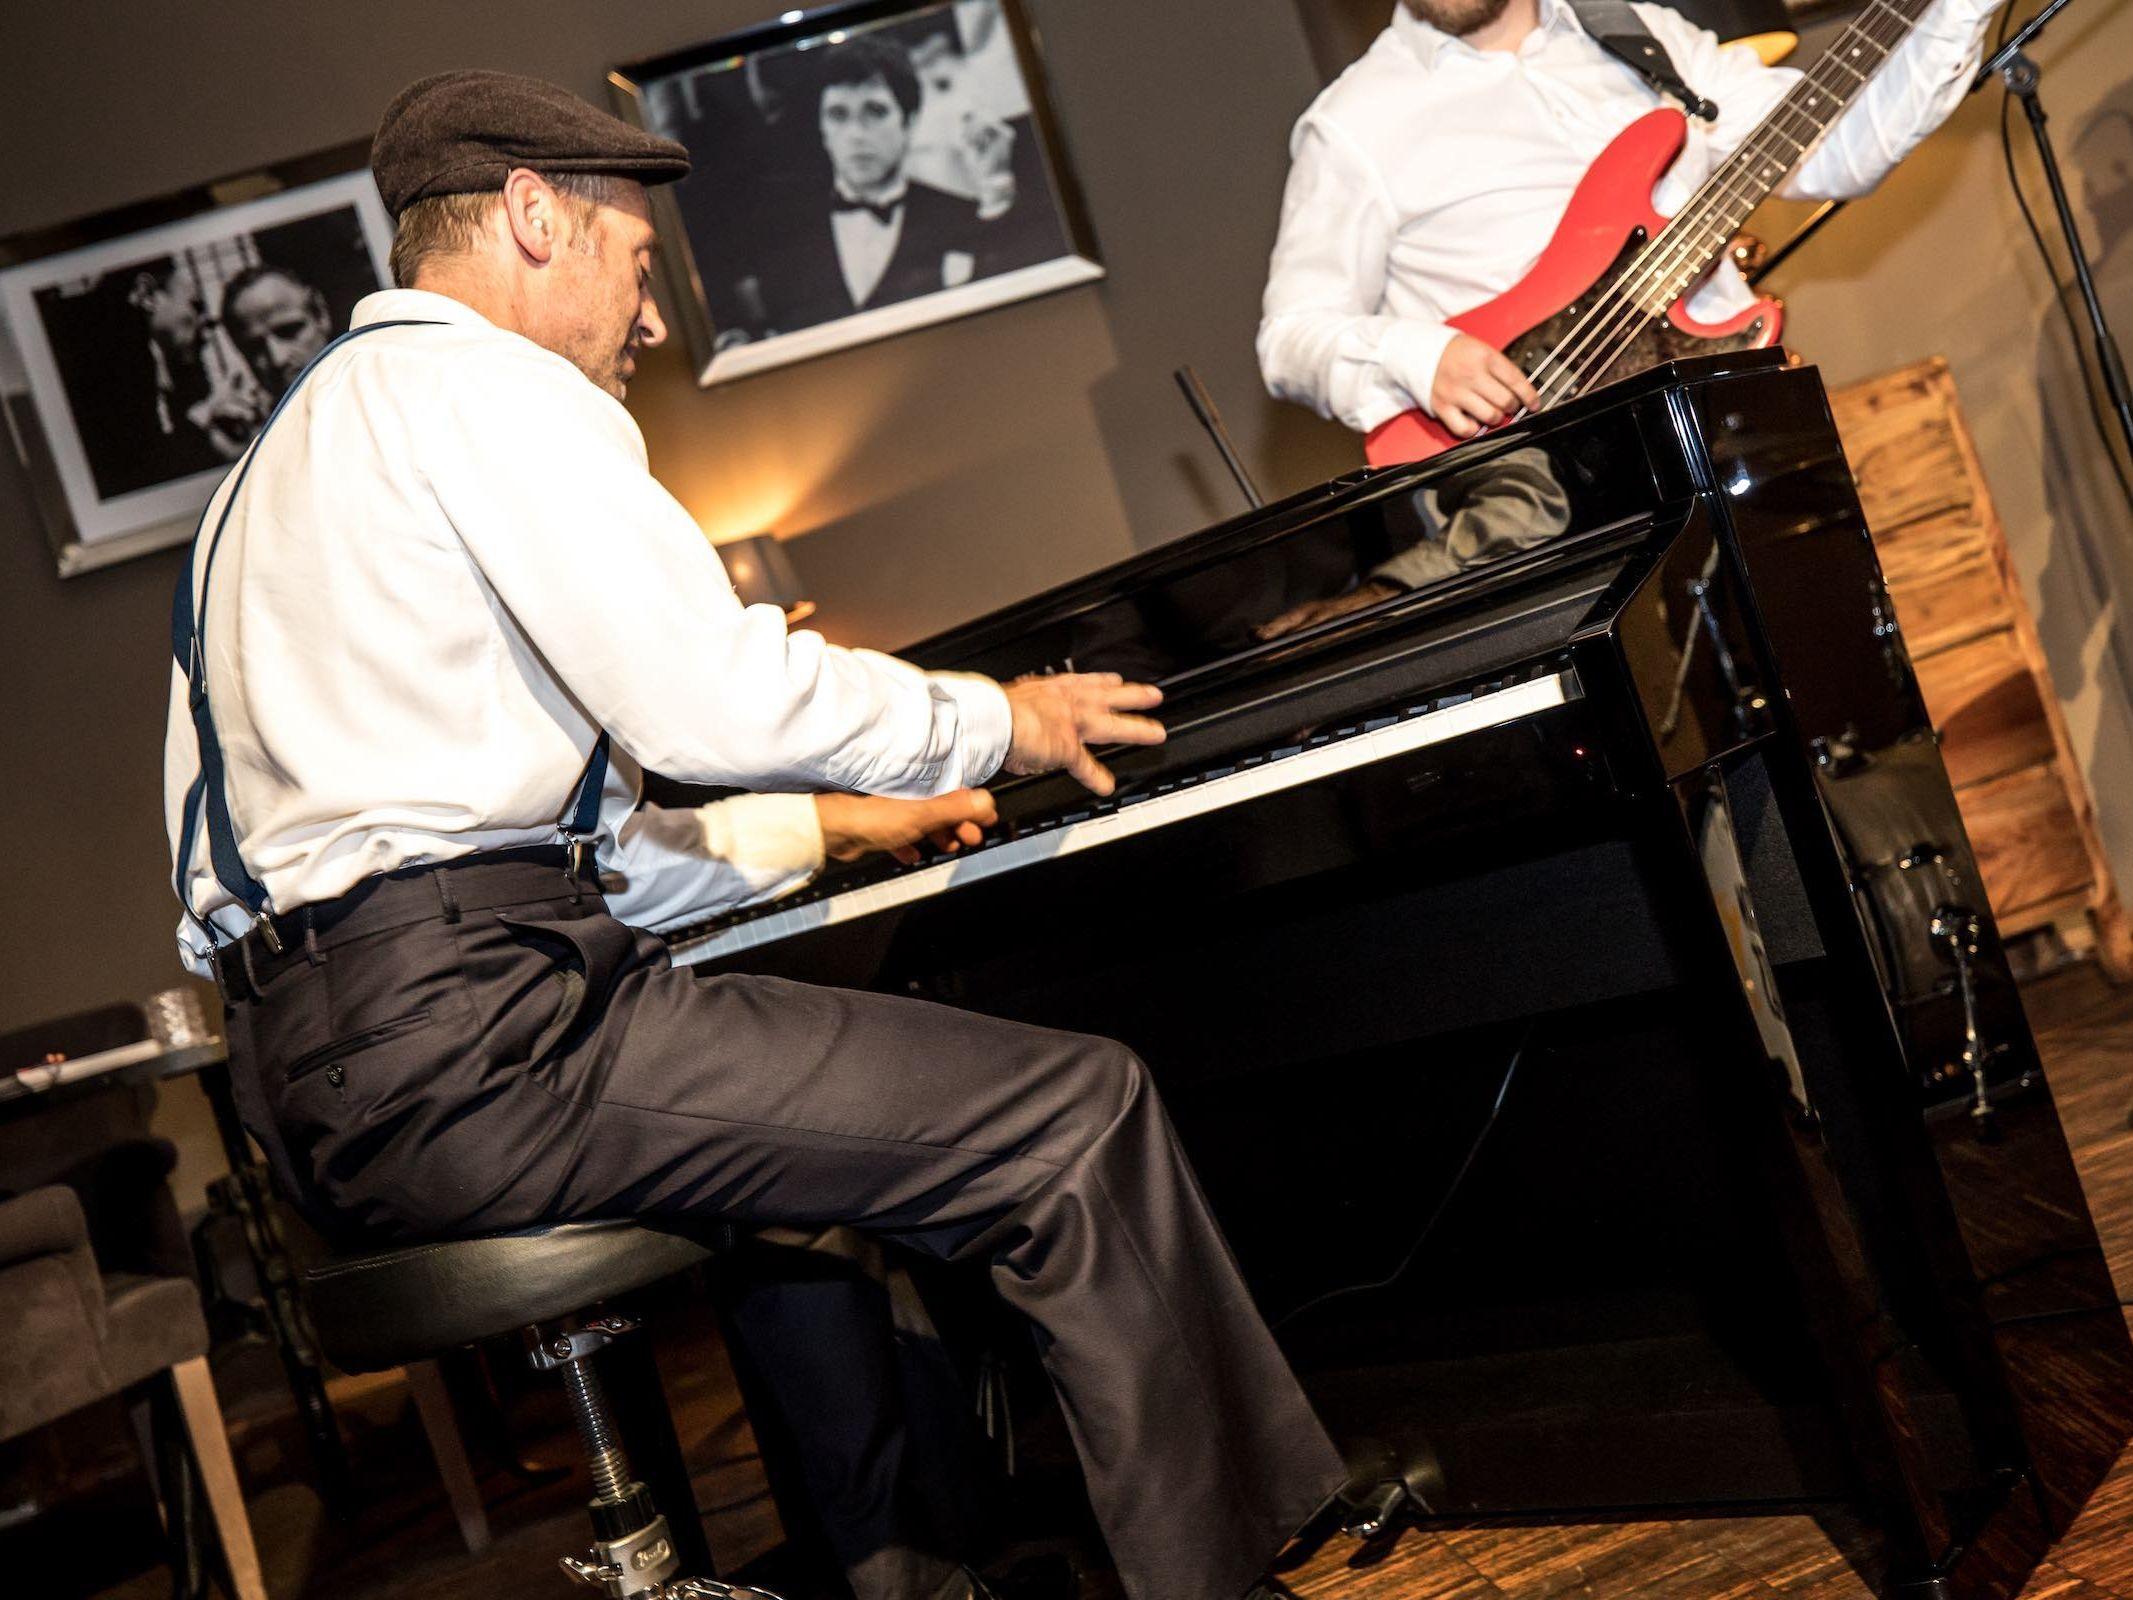 Klavierspieler | Pianist | Hannover | Flügel | Piano | Hochzeit | Buchen | Livemusik | Jazz | Swing | Pop | Motown | Soul | Klavier | Messe | Firmenfeier | Empfang | Buchen | Mieten | Anfragen | Lehmann | Eventservice